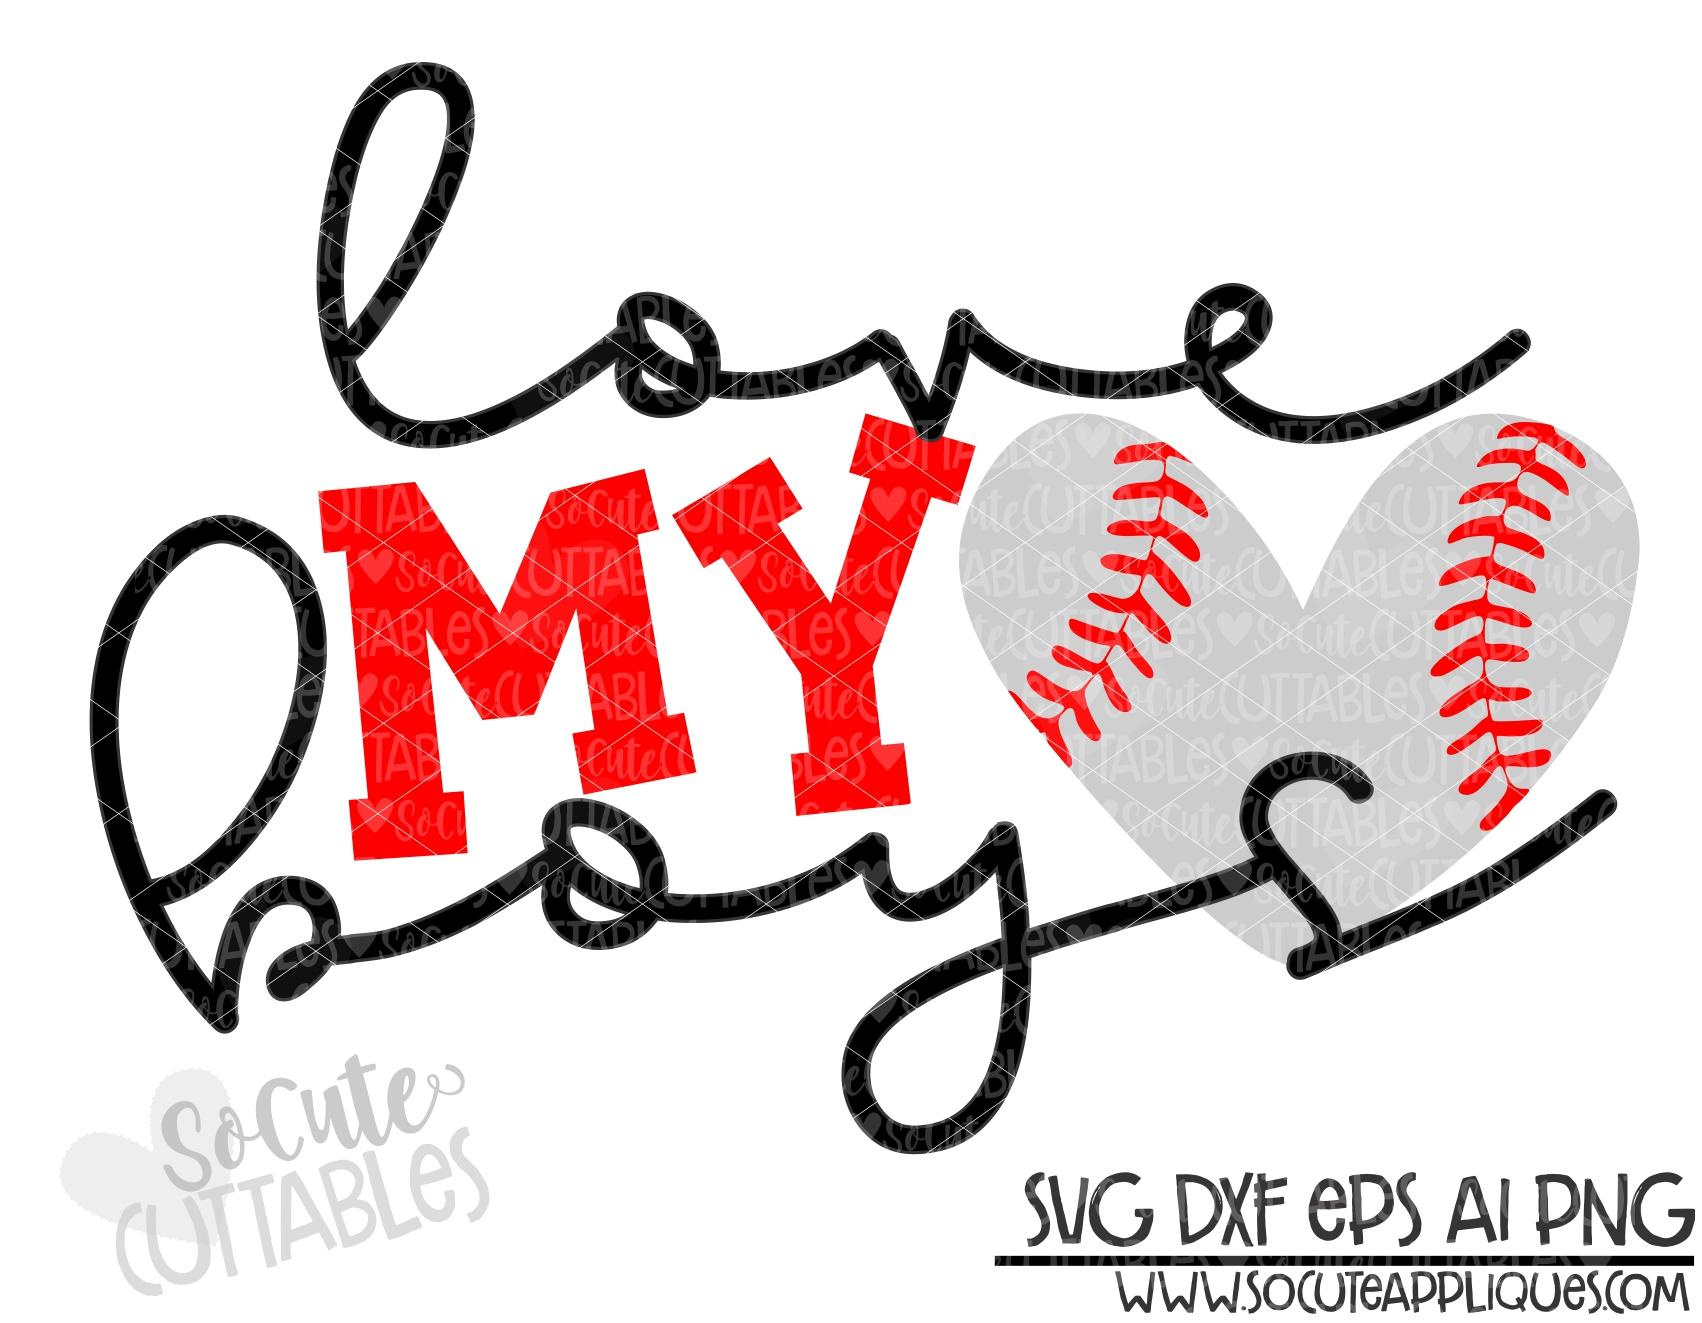 Download love my boys baseball heart 19 scc SVG - socuteappliques.net